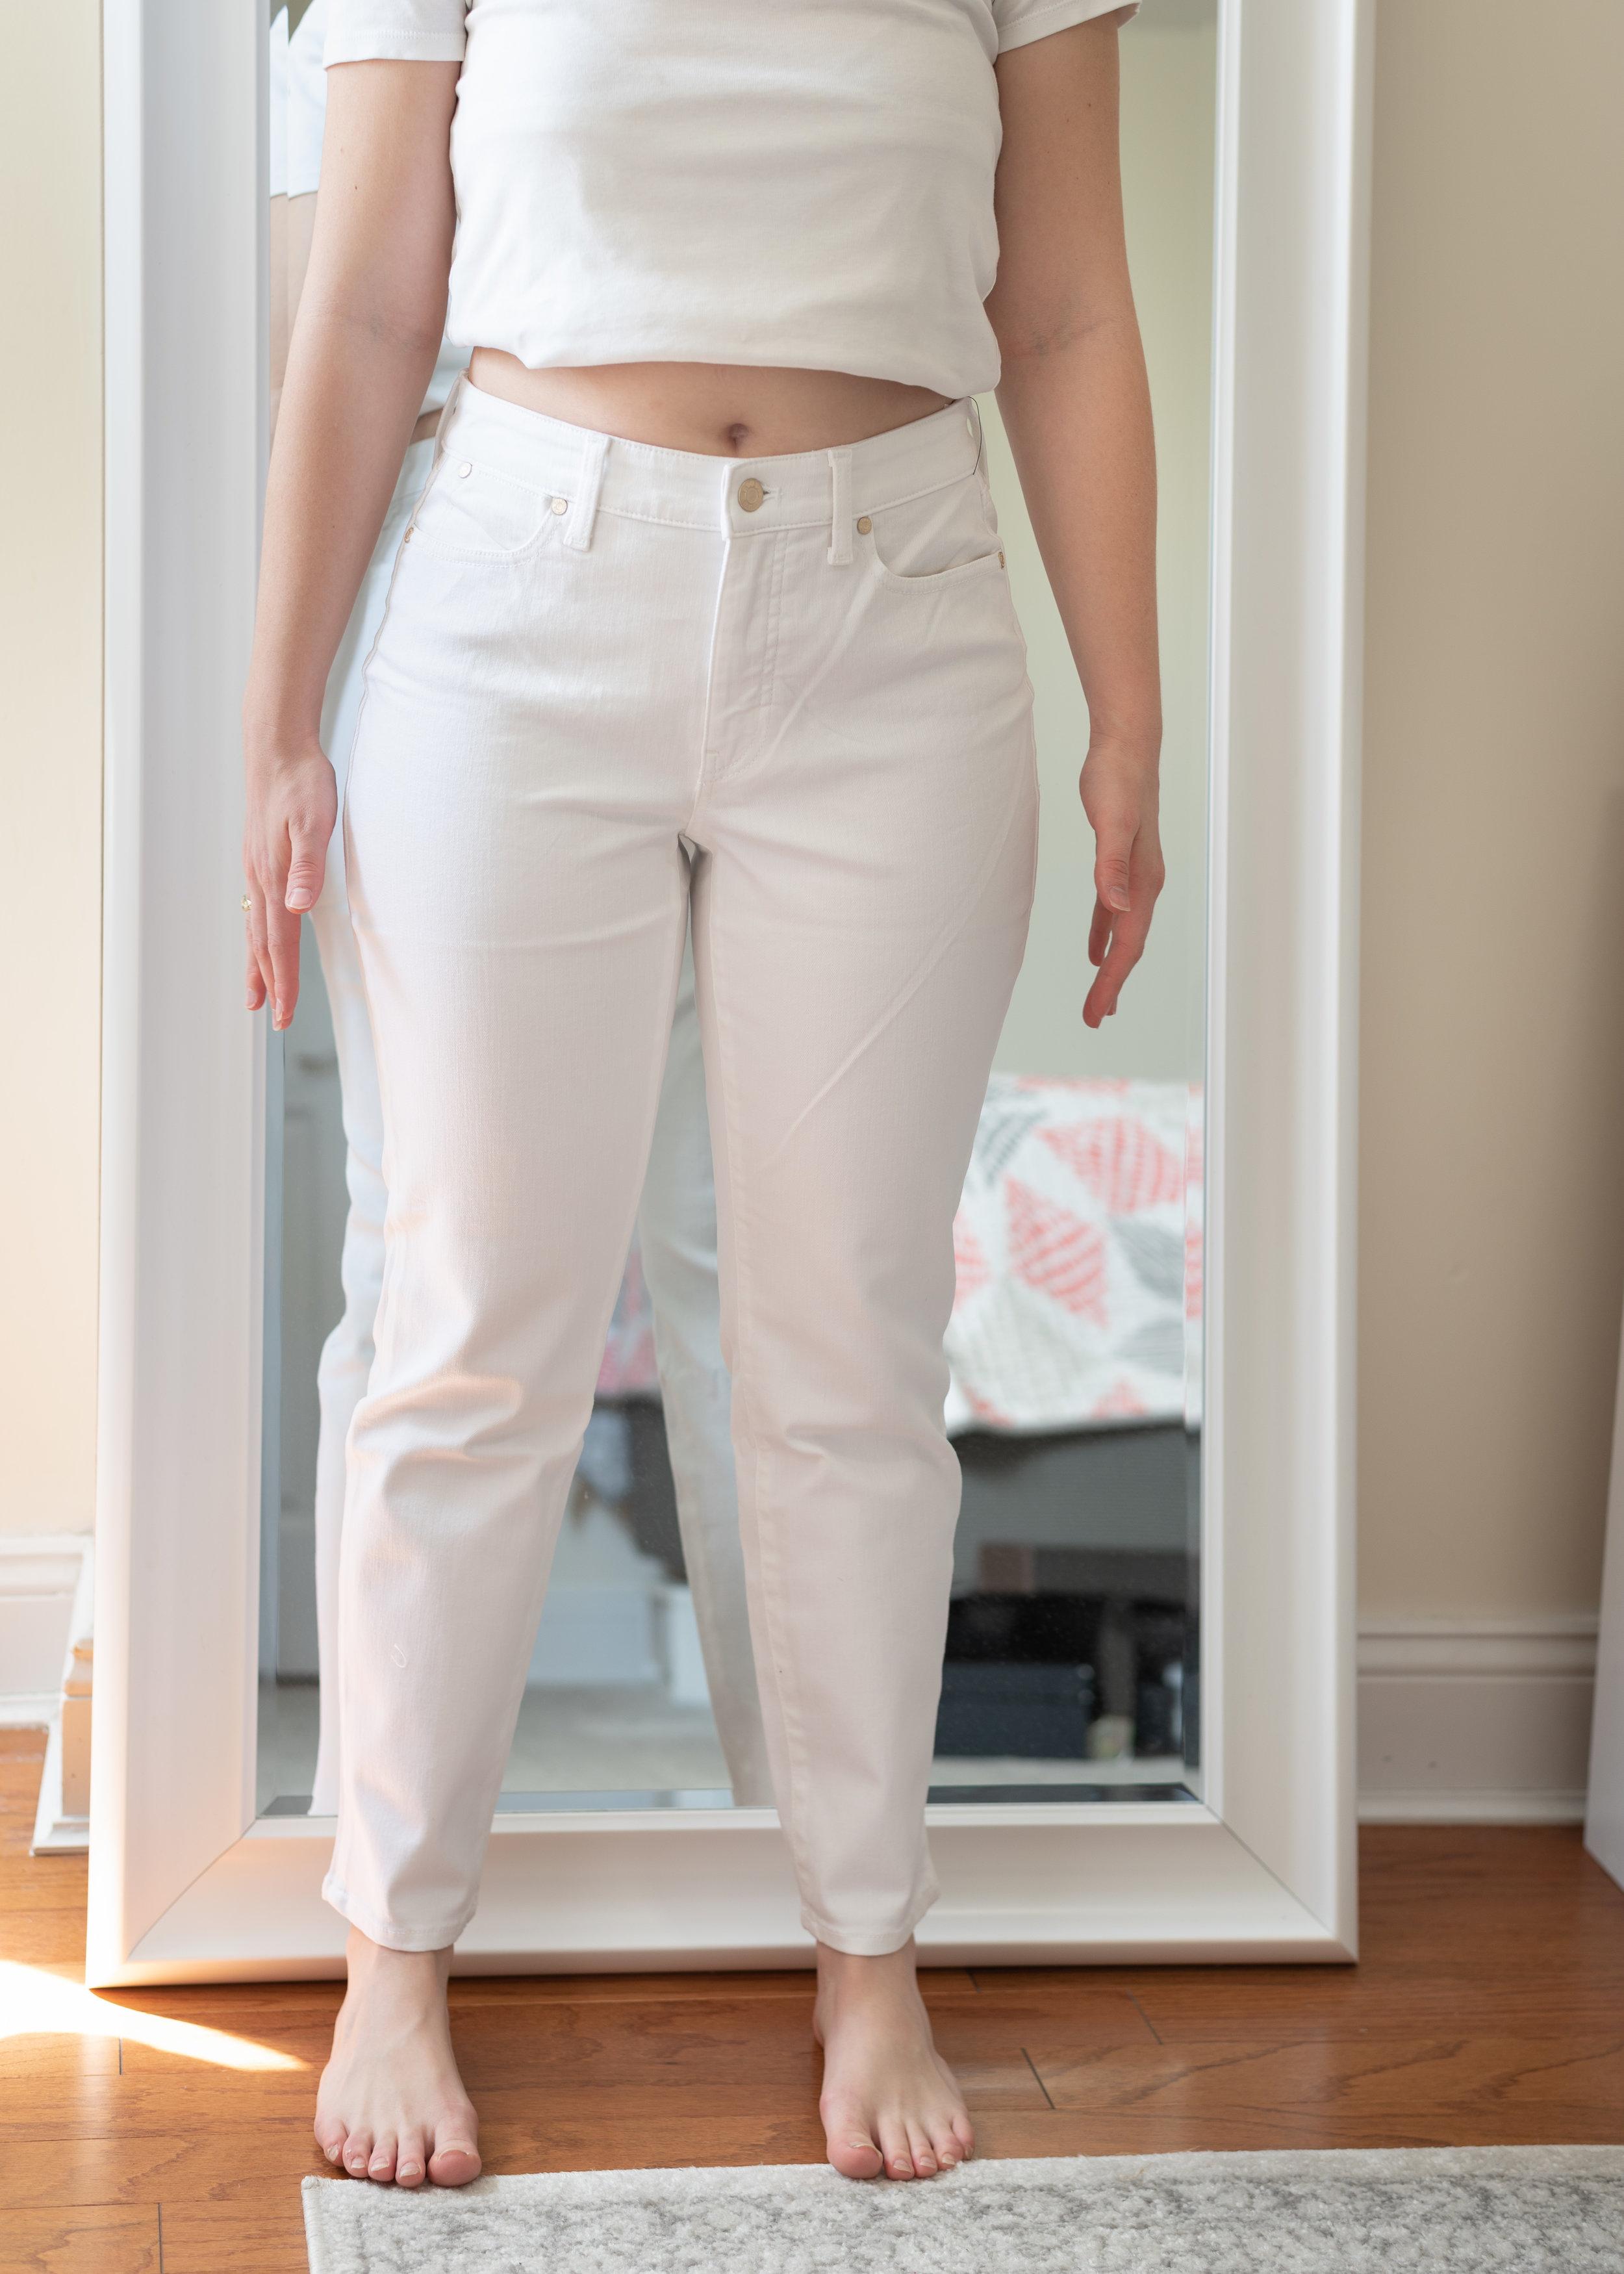 Talbots Curvy Fit Slim Leg Ankle Jeans - Size 6 Petite